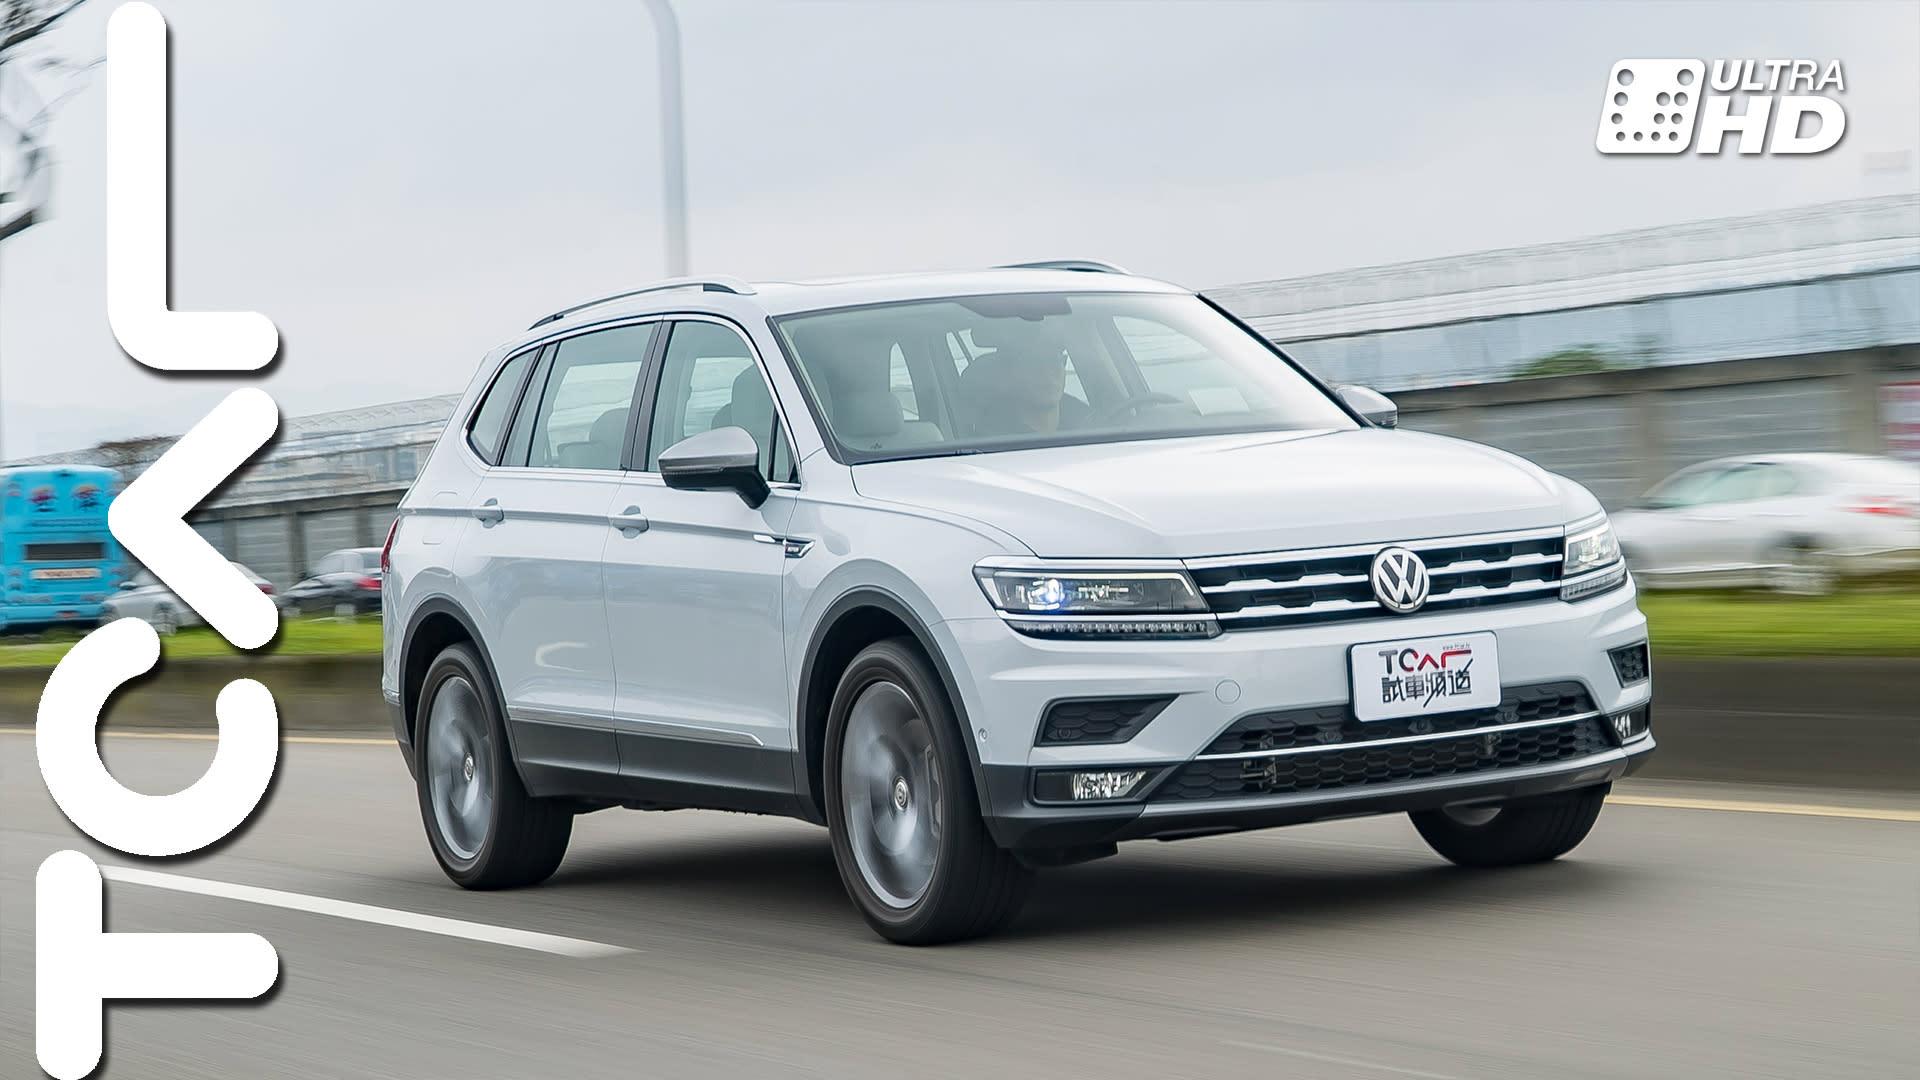 幸福滿艙 Volkswagen Tiguan Allspace 400 TDI Highline 新車試駕 - TCAR